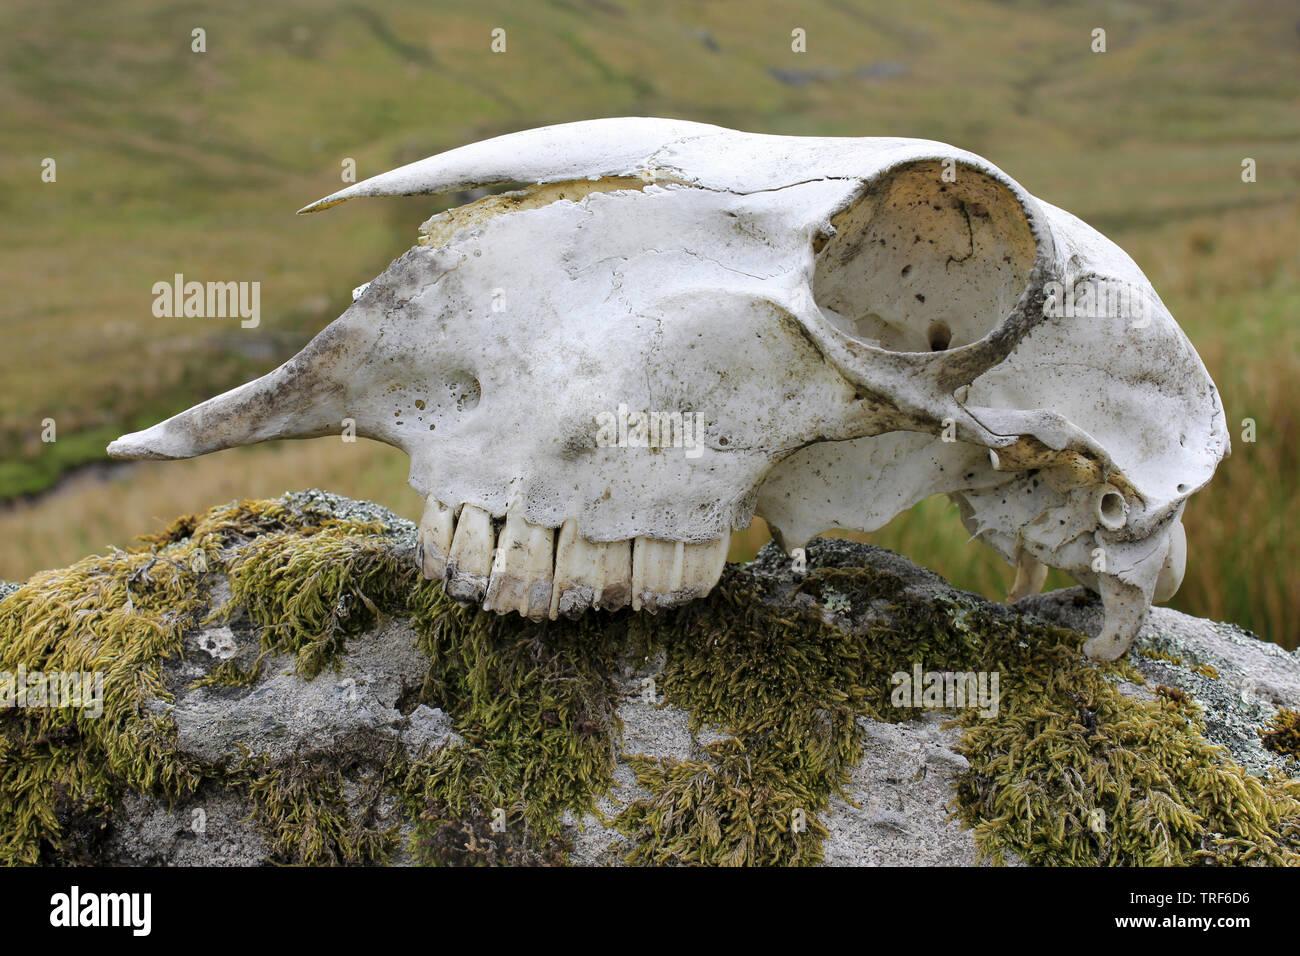 Sheep Skull Stock Photos & Sheep Skull Stock Images - Alamy